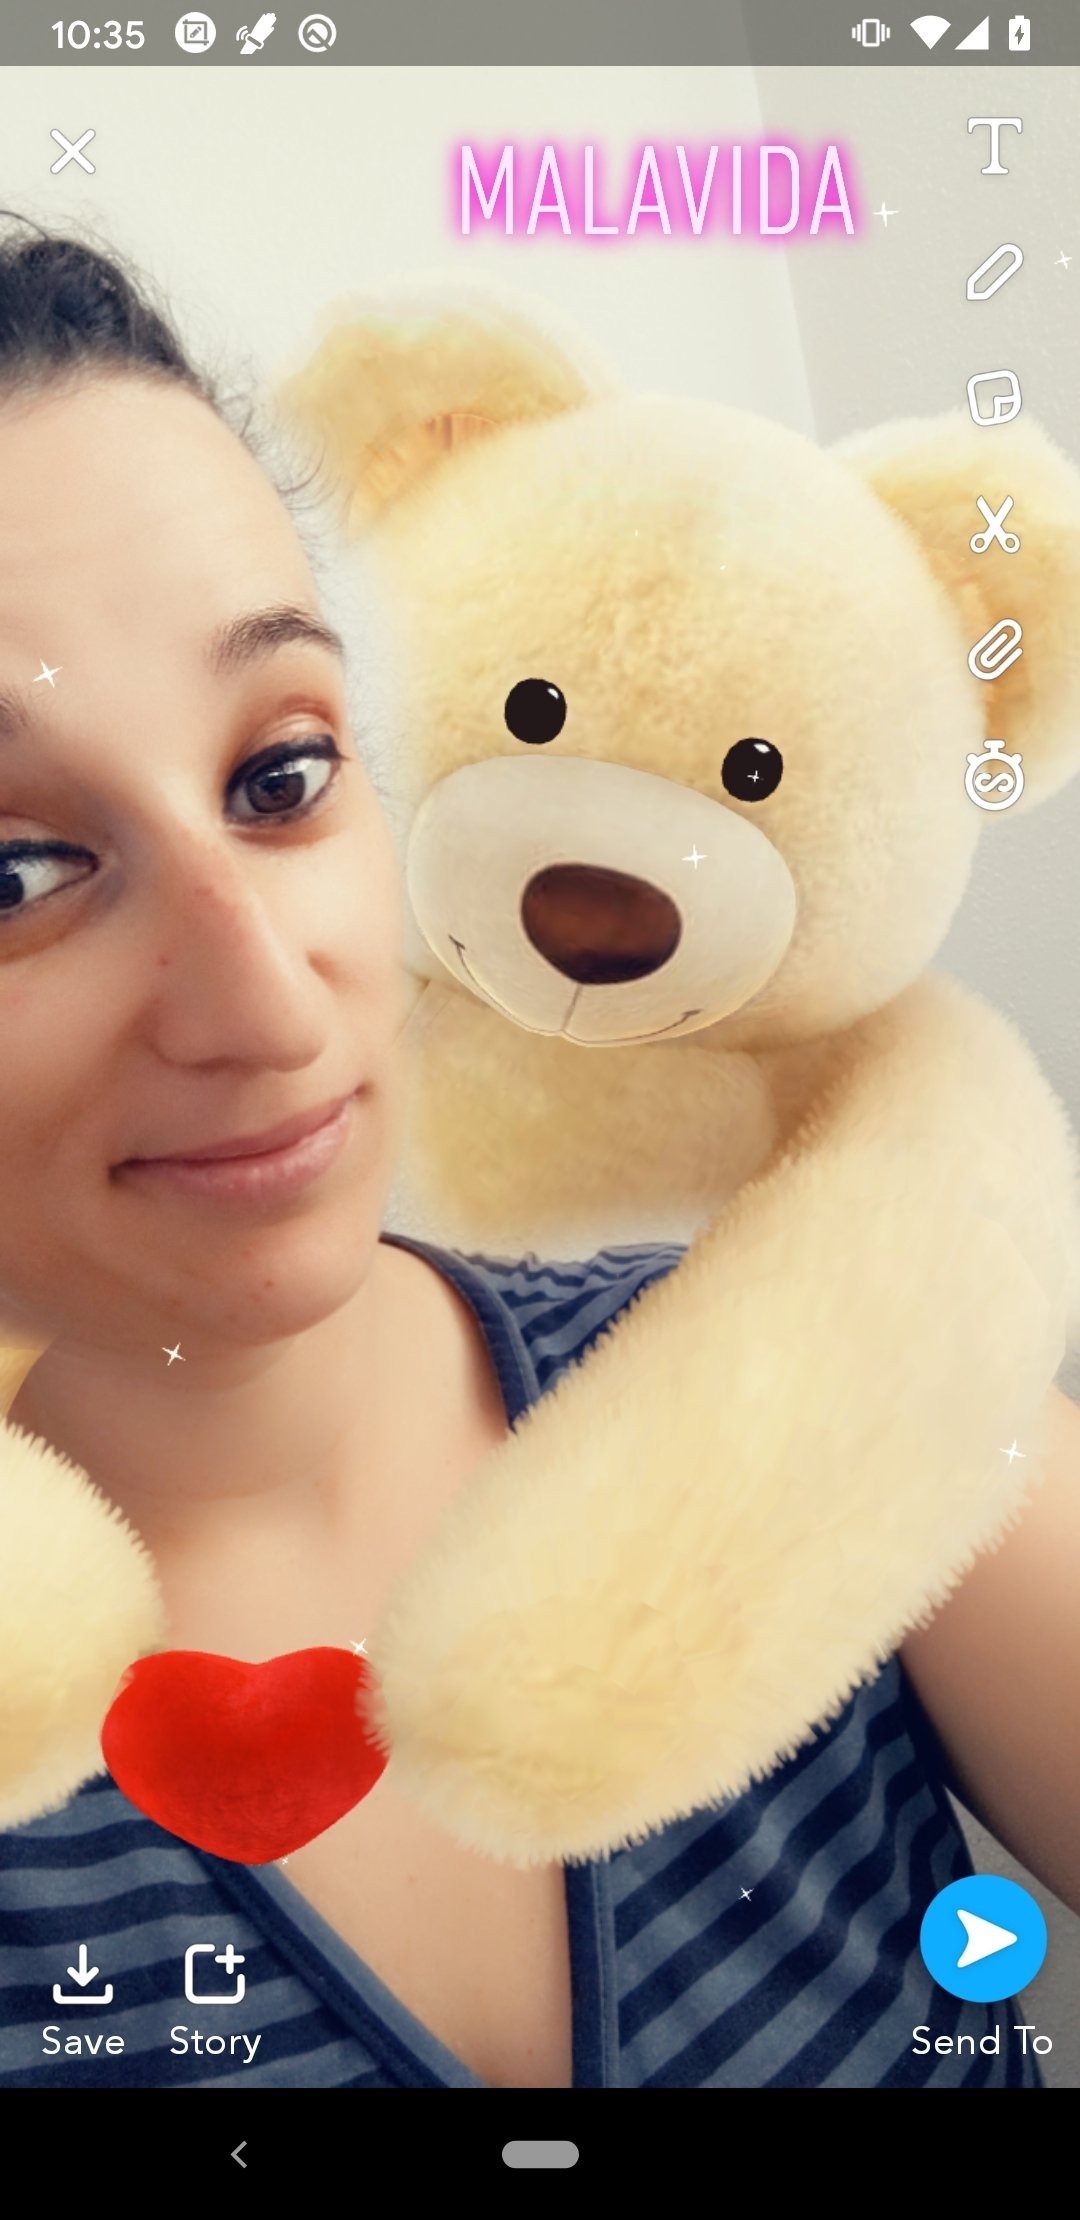 Snapchat Android image 8